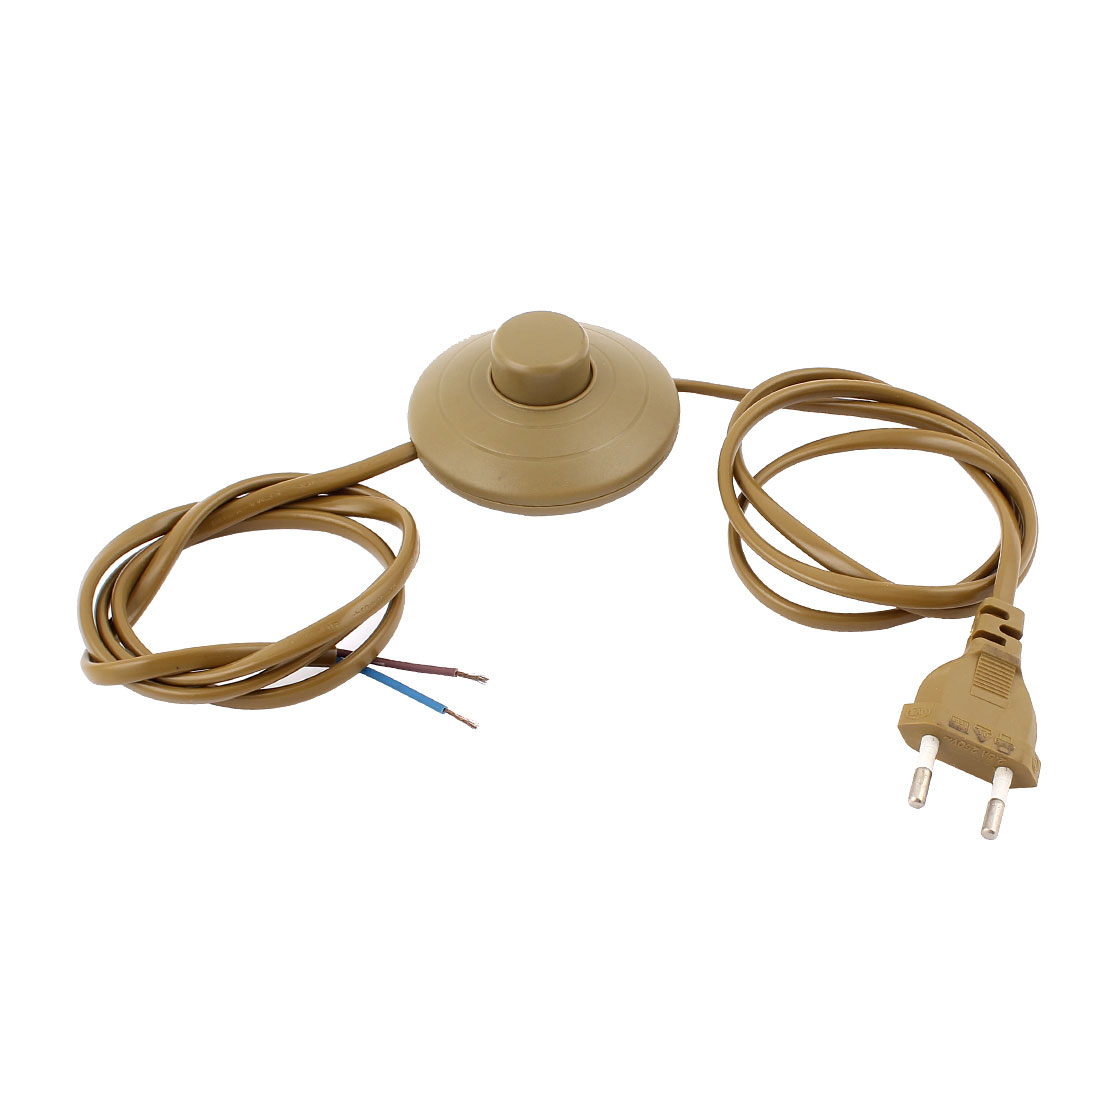 3A/125V AC Plastic EU Plug On-Off Light Power Foot Switch 1.8M